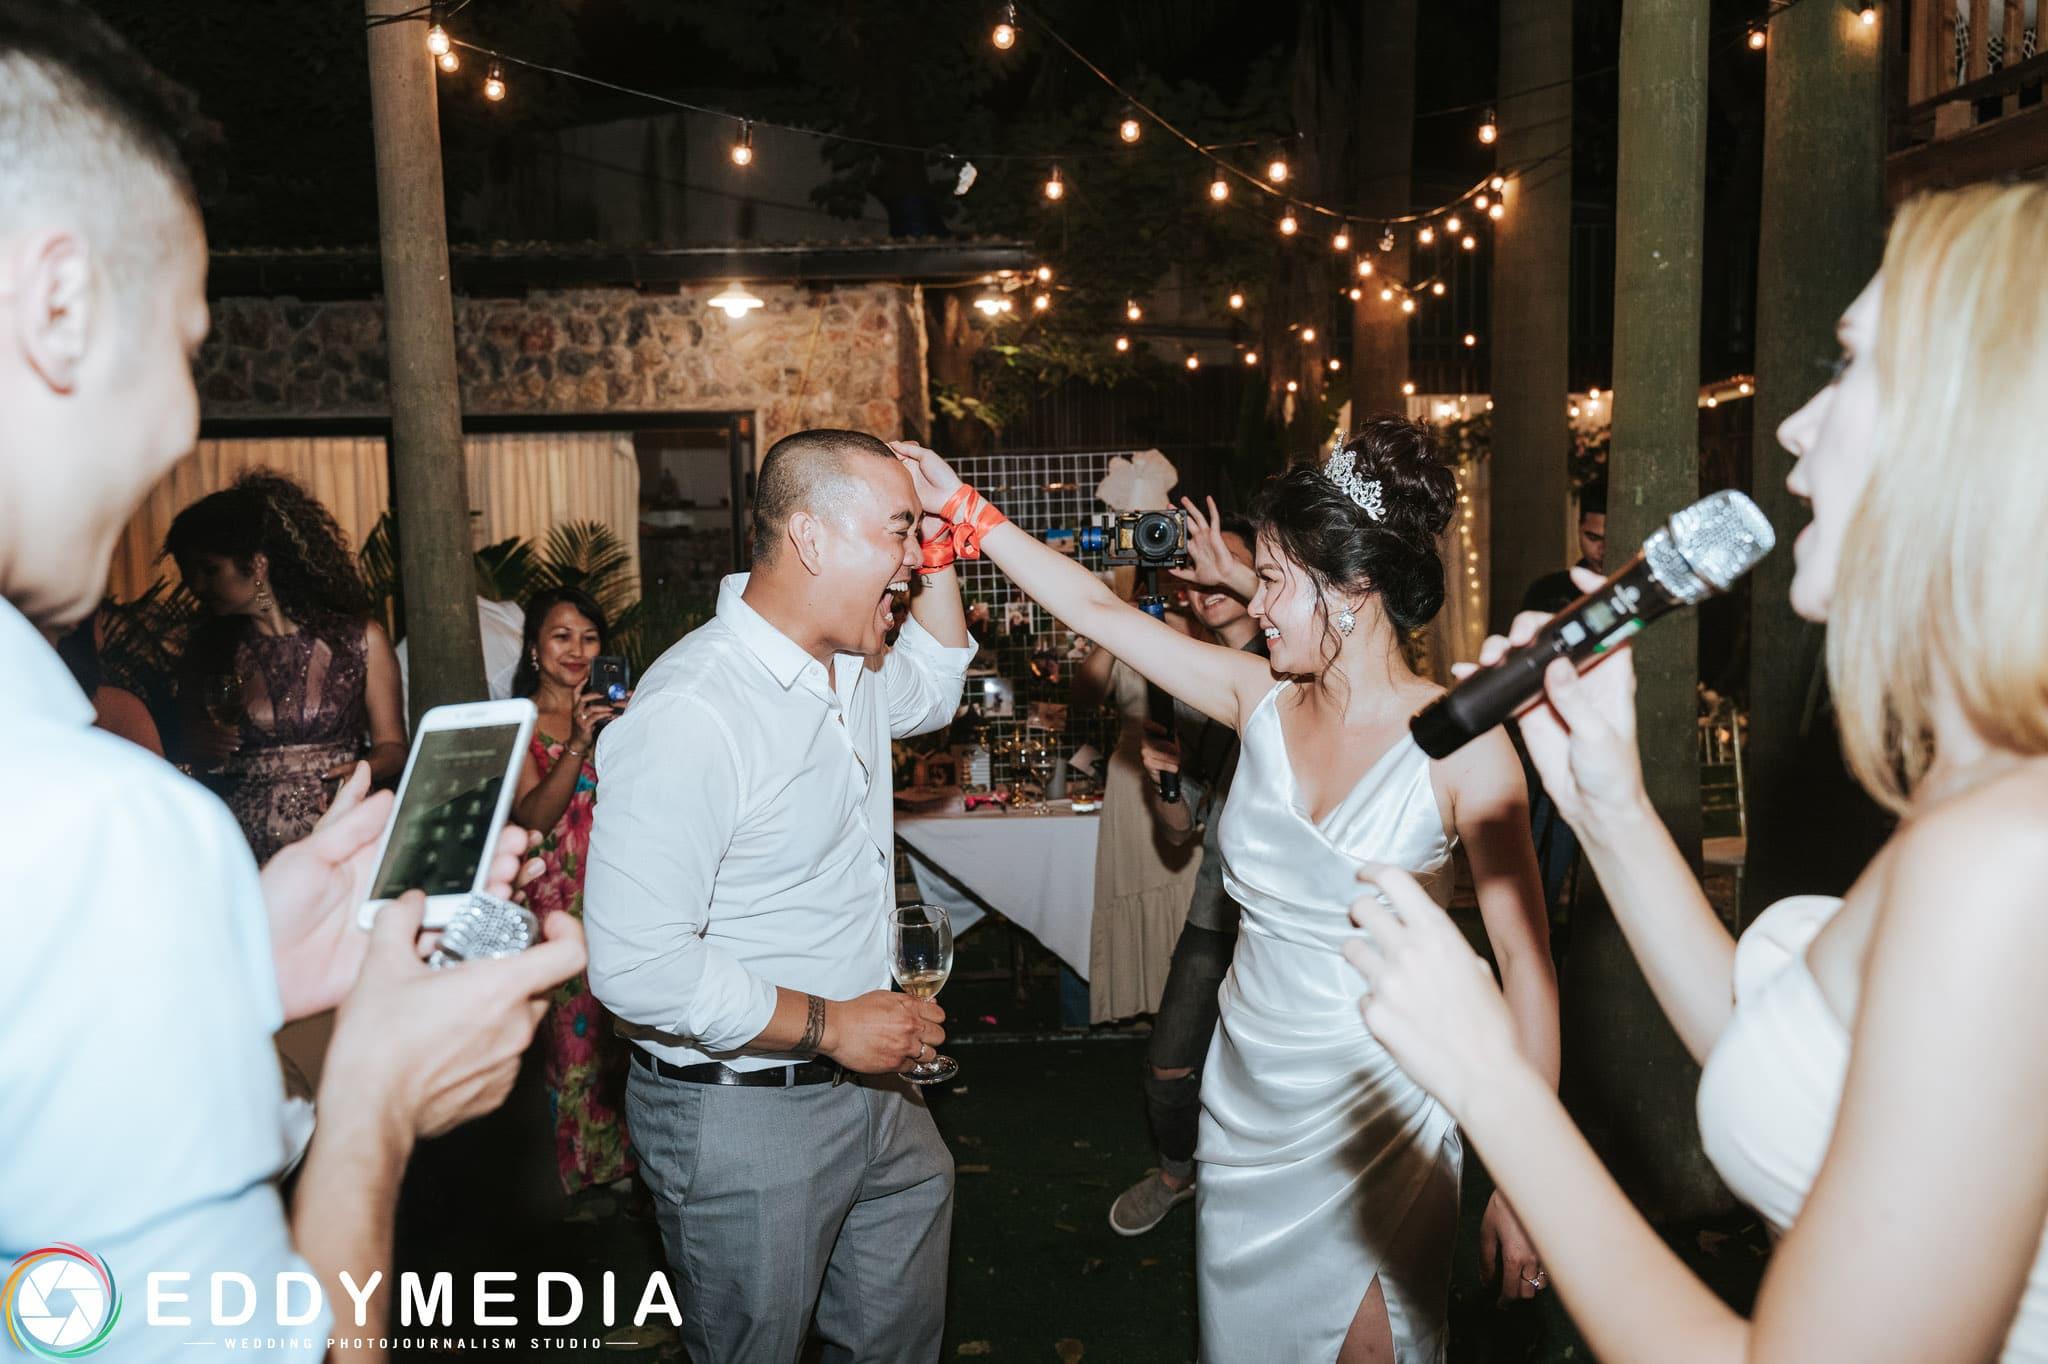 Phongsucuoi James KieuThuy EddyMedia 53 tiệc cưới ngoài trời